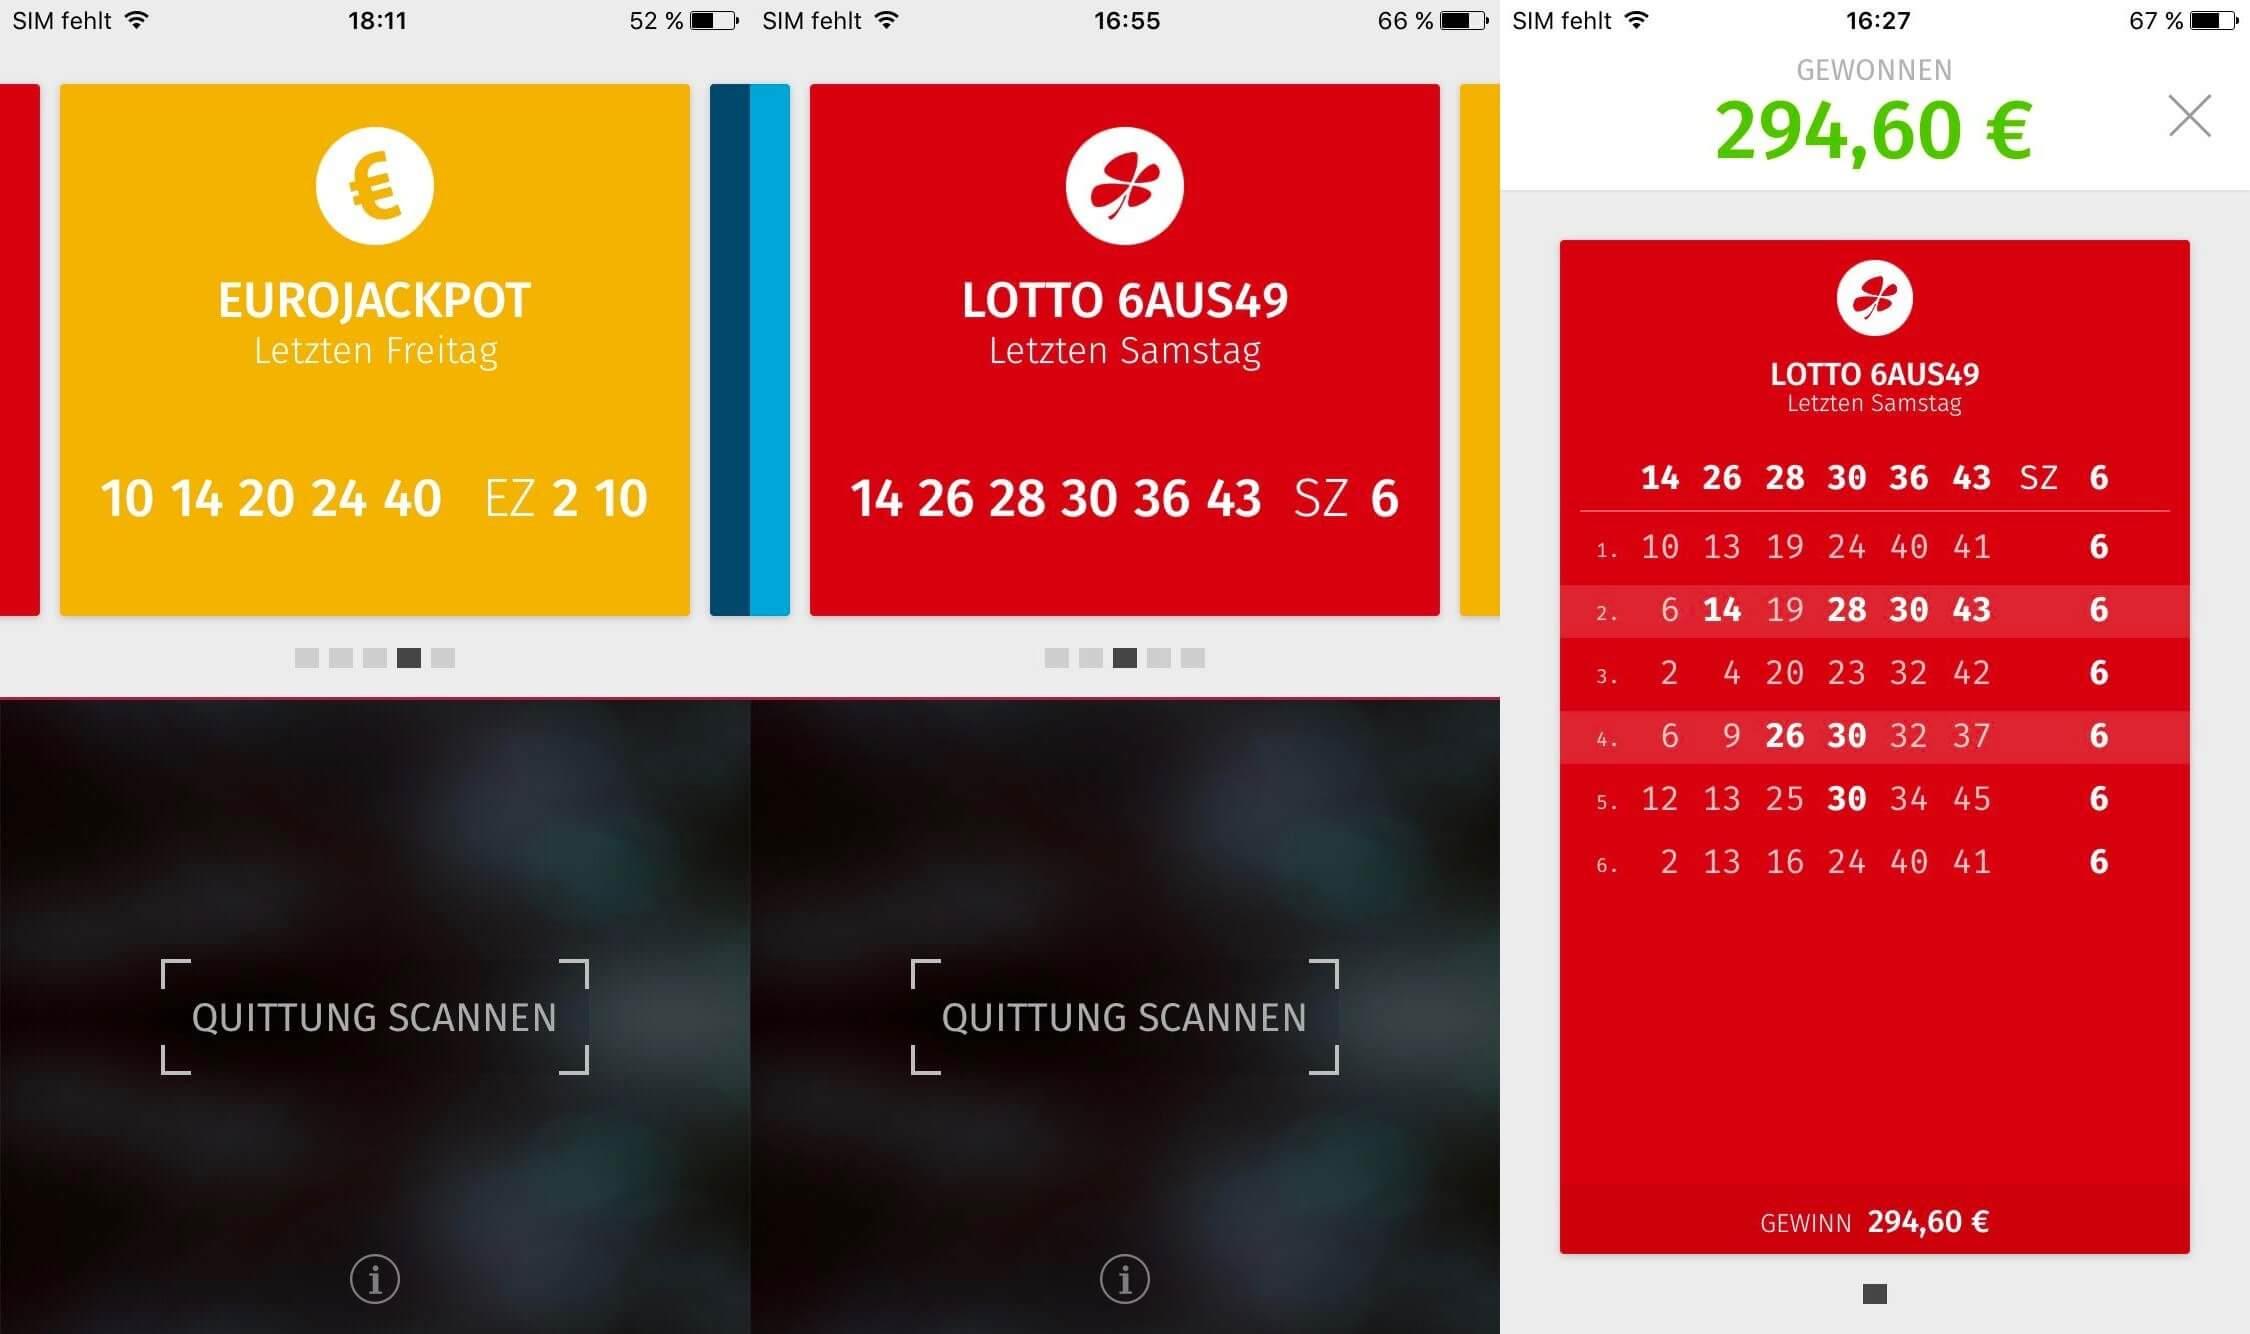 Mega Lottogewinn Sportwetten - 91253